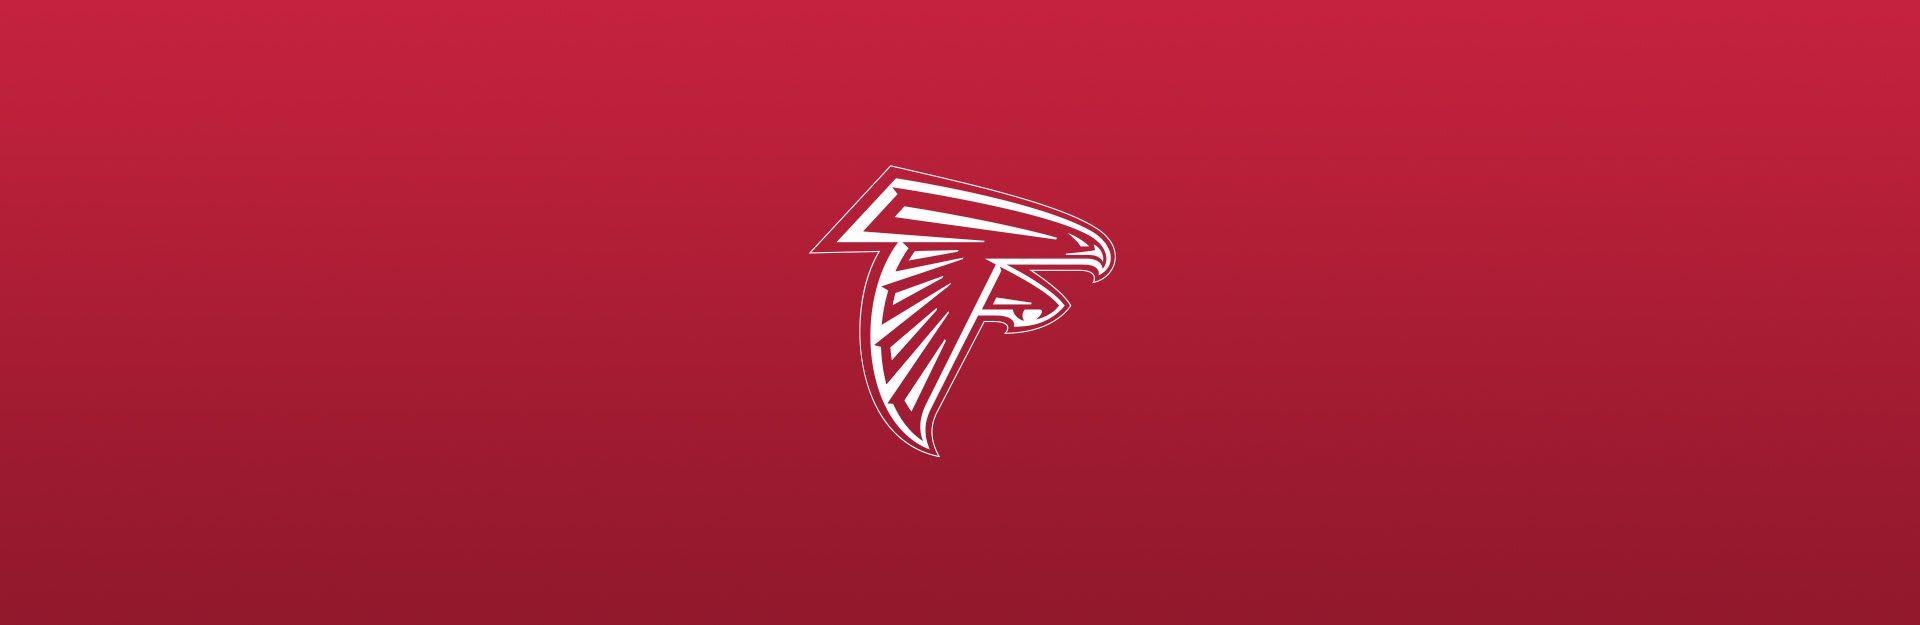 Atlanta Falcons logo on red background